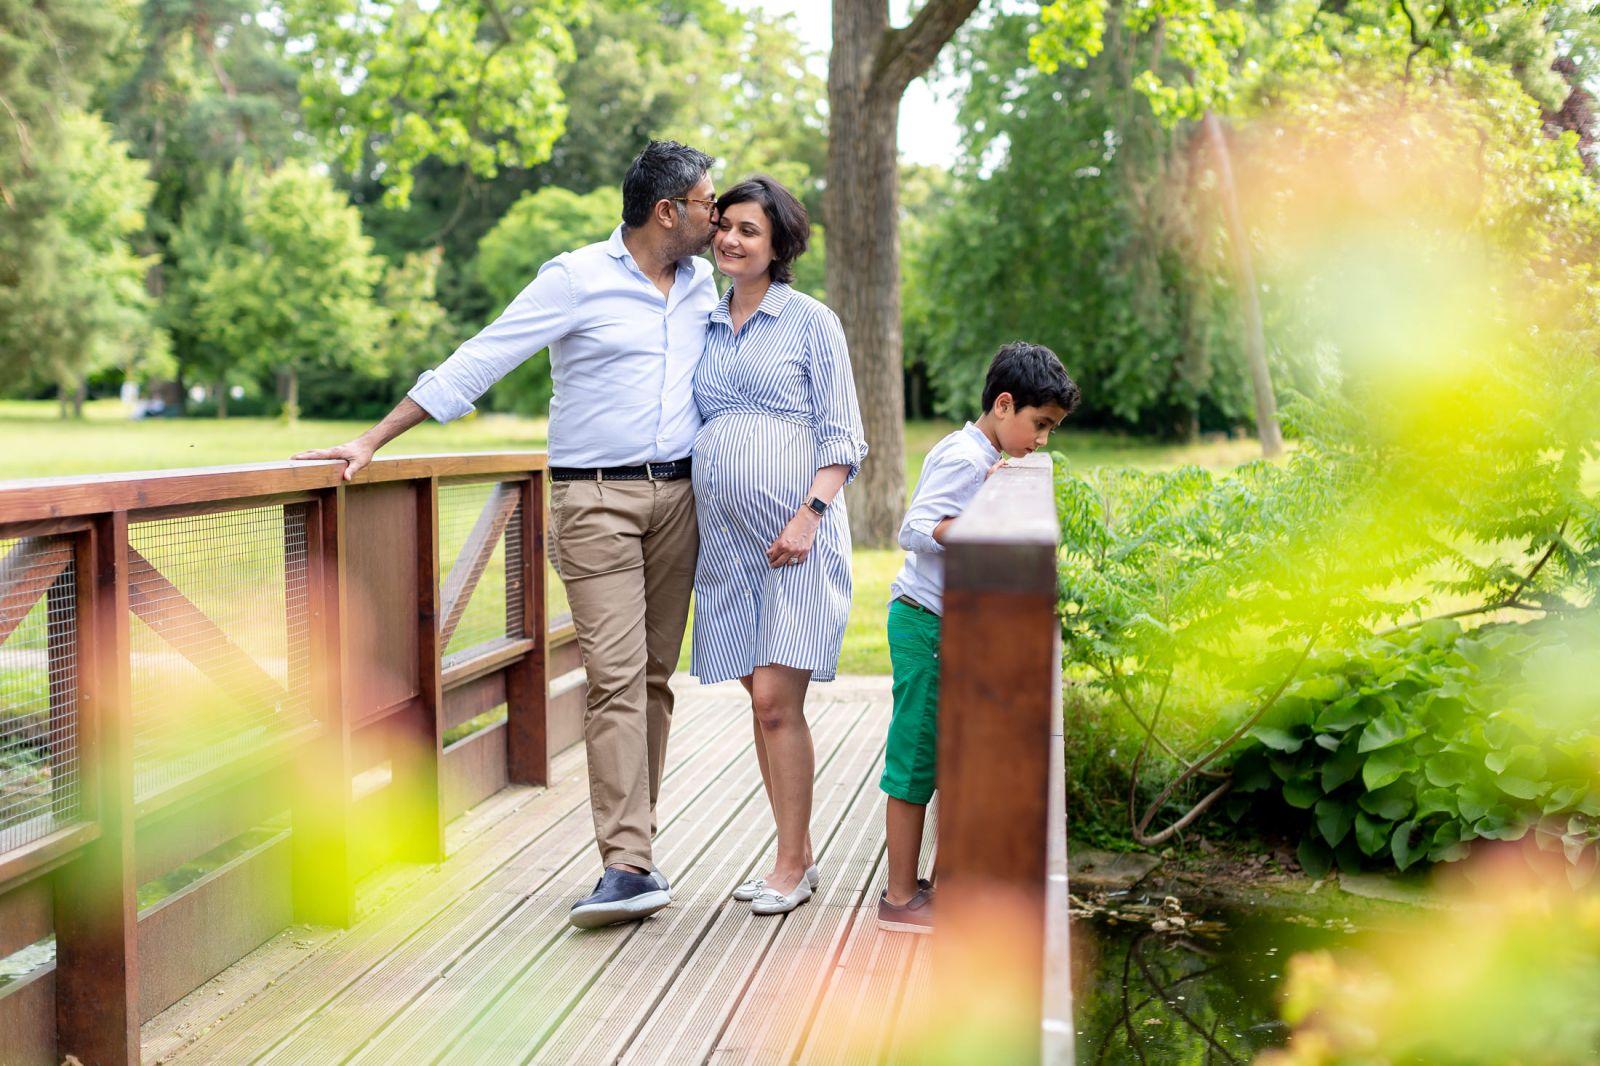 photographe grossesse en famille paris agnes colombo